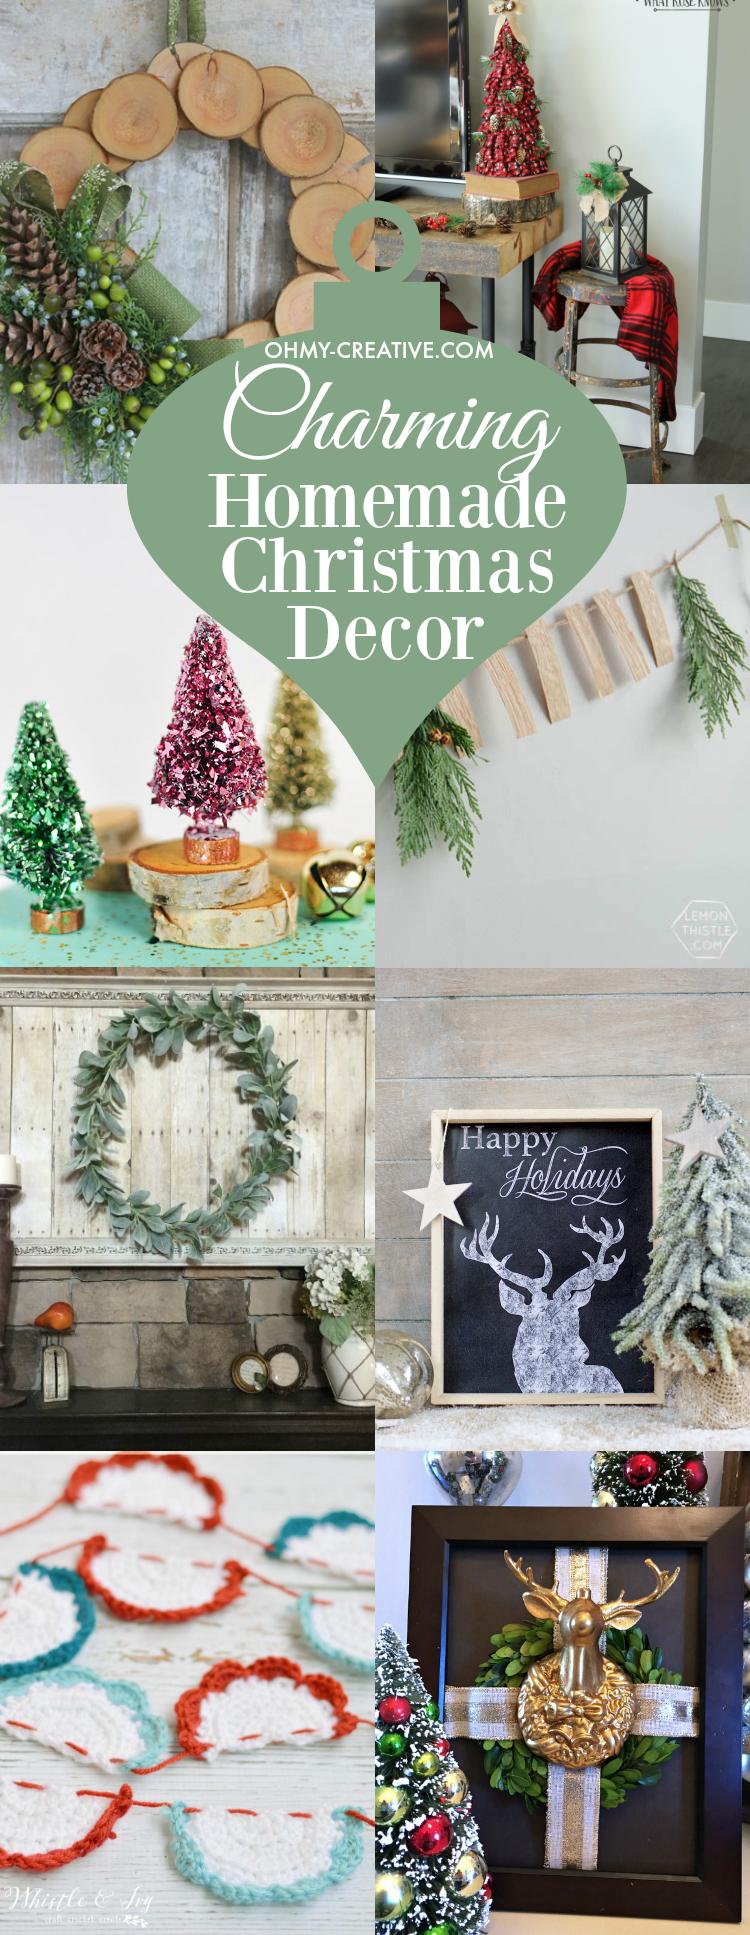 Charming homemade christmas decor oh my creative for Home madechristmas decorations